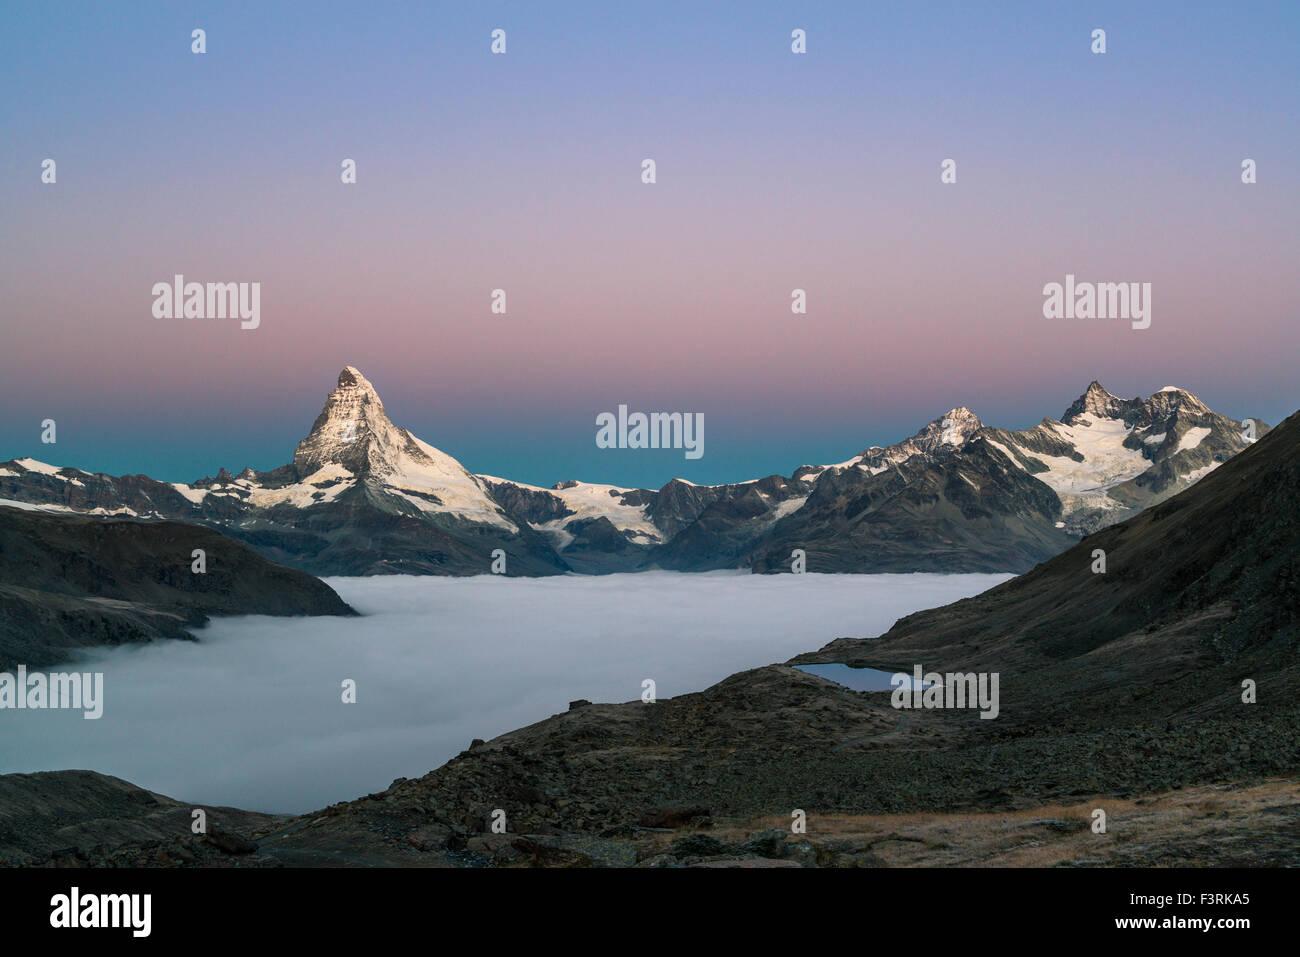 Matterhorn con nubes al amanecer, Suiza Imagen De Stock